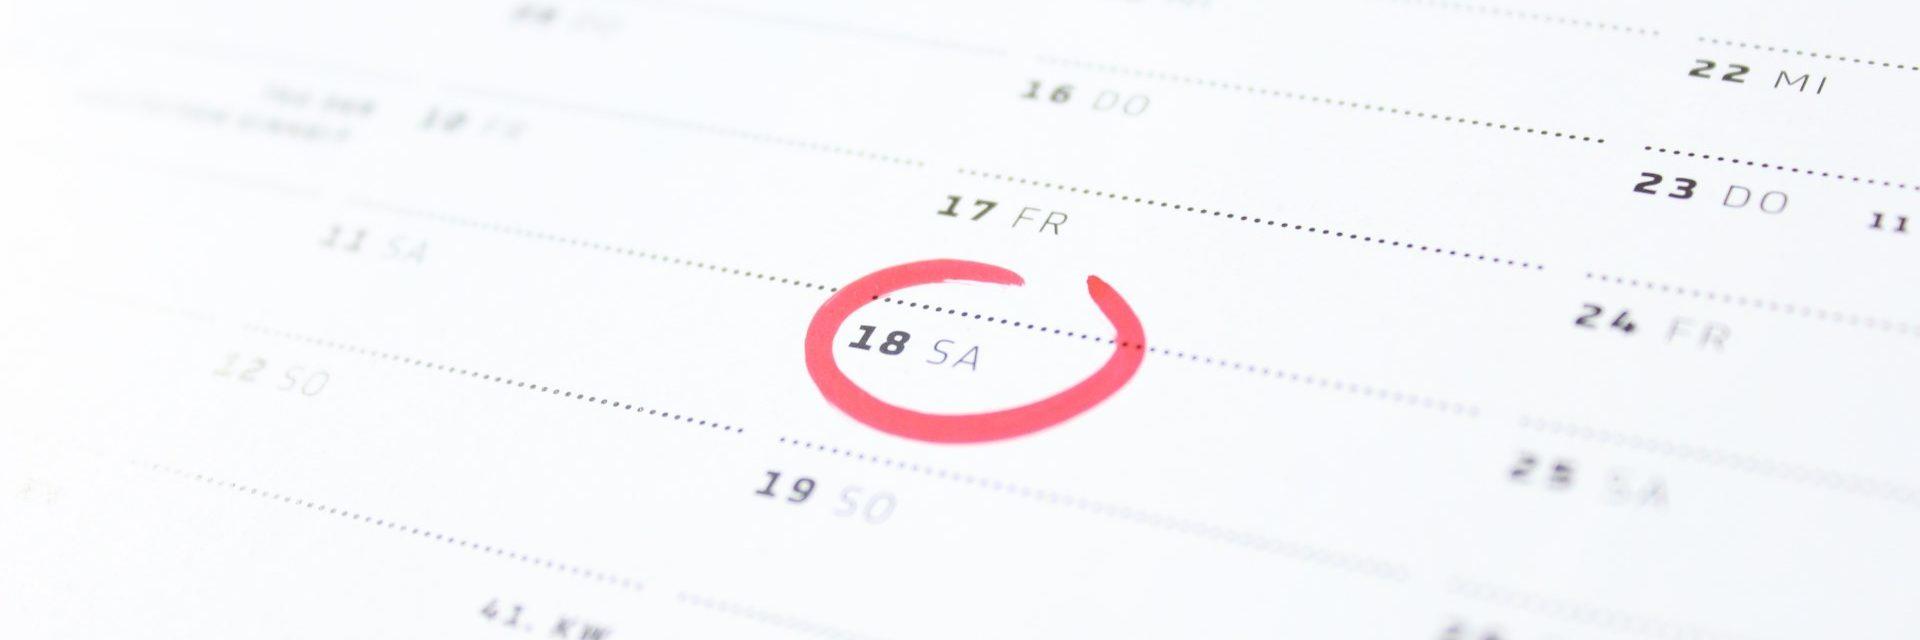 calendar-1920-840